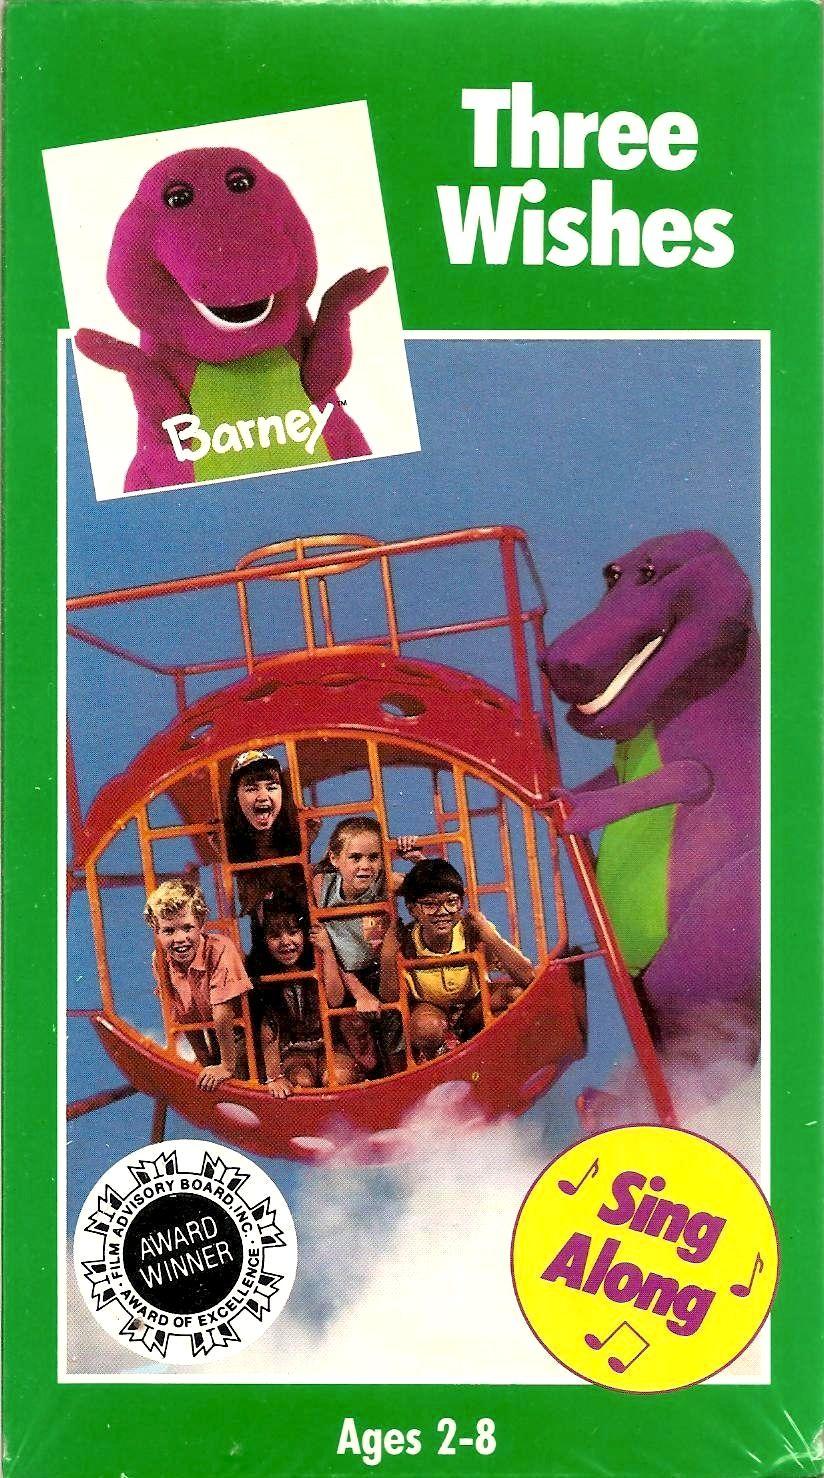 barney collection g family musical adventure fantasy short